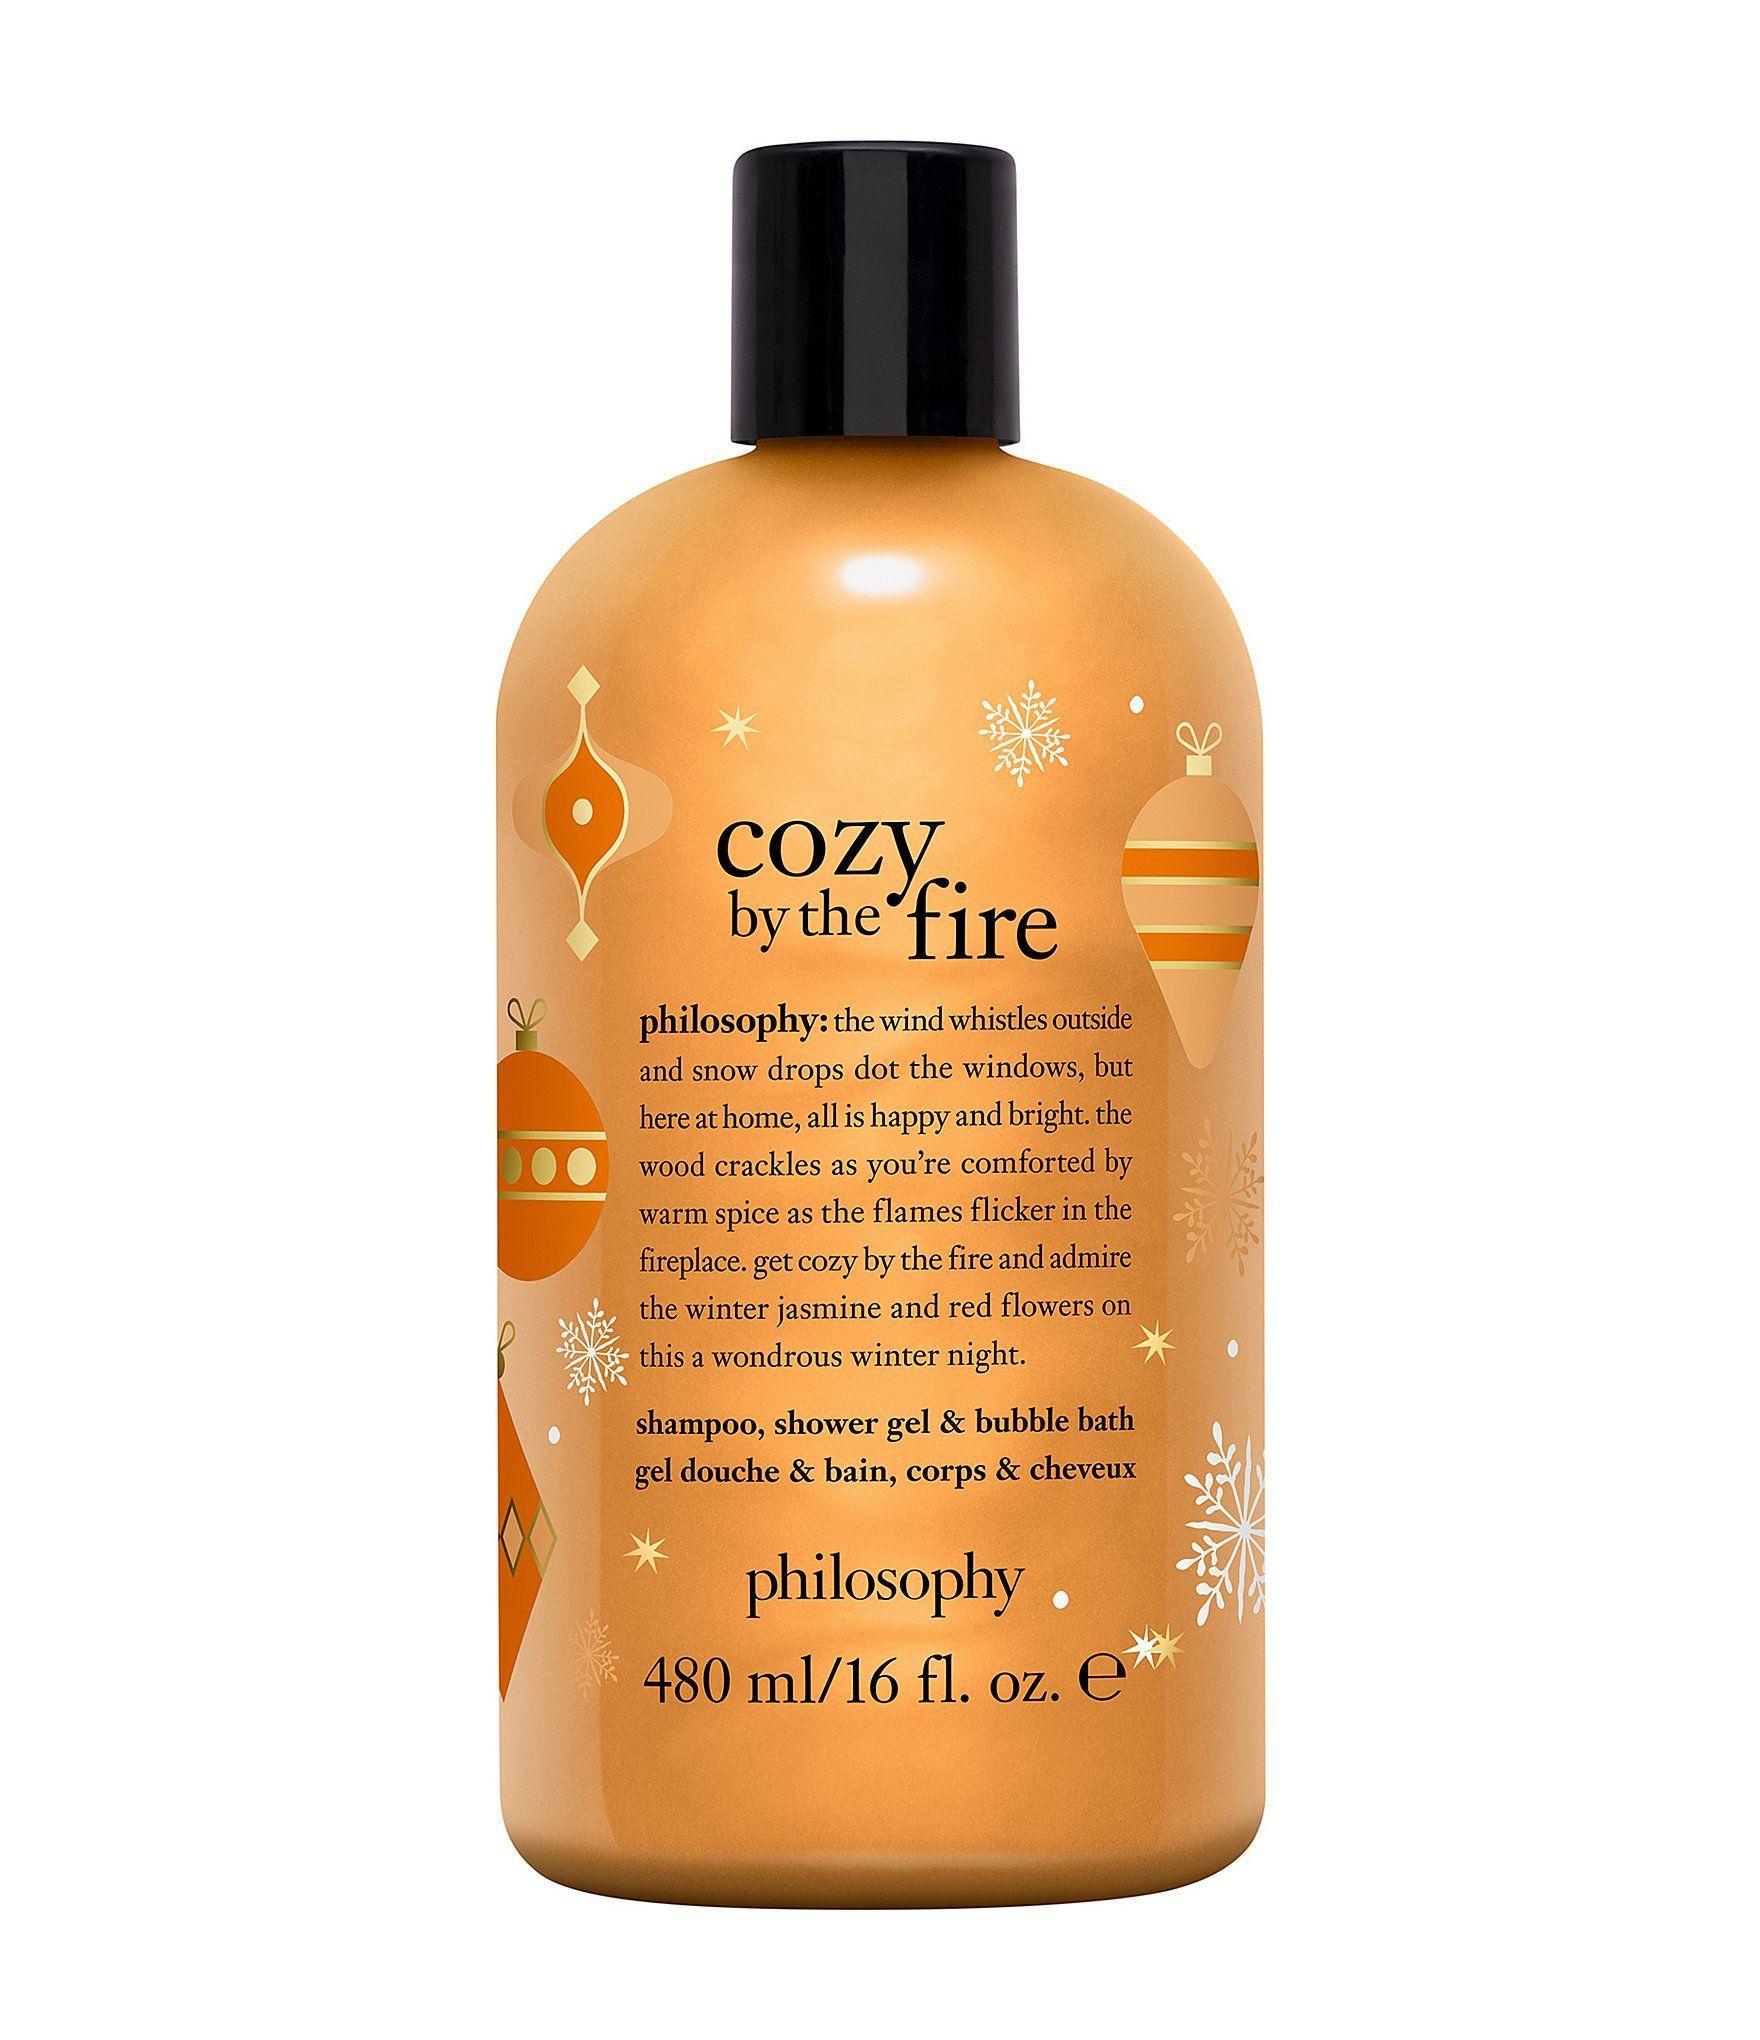 Philosophy Cozy By The Fire Shampoo Shower Gel Bubble Bath Limited Edition Dillard S In 2021 Philosophy Shower Gel Shower Gel Shampoo